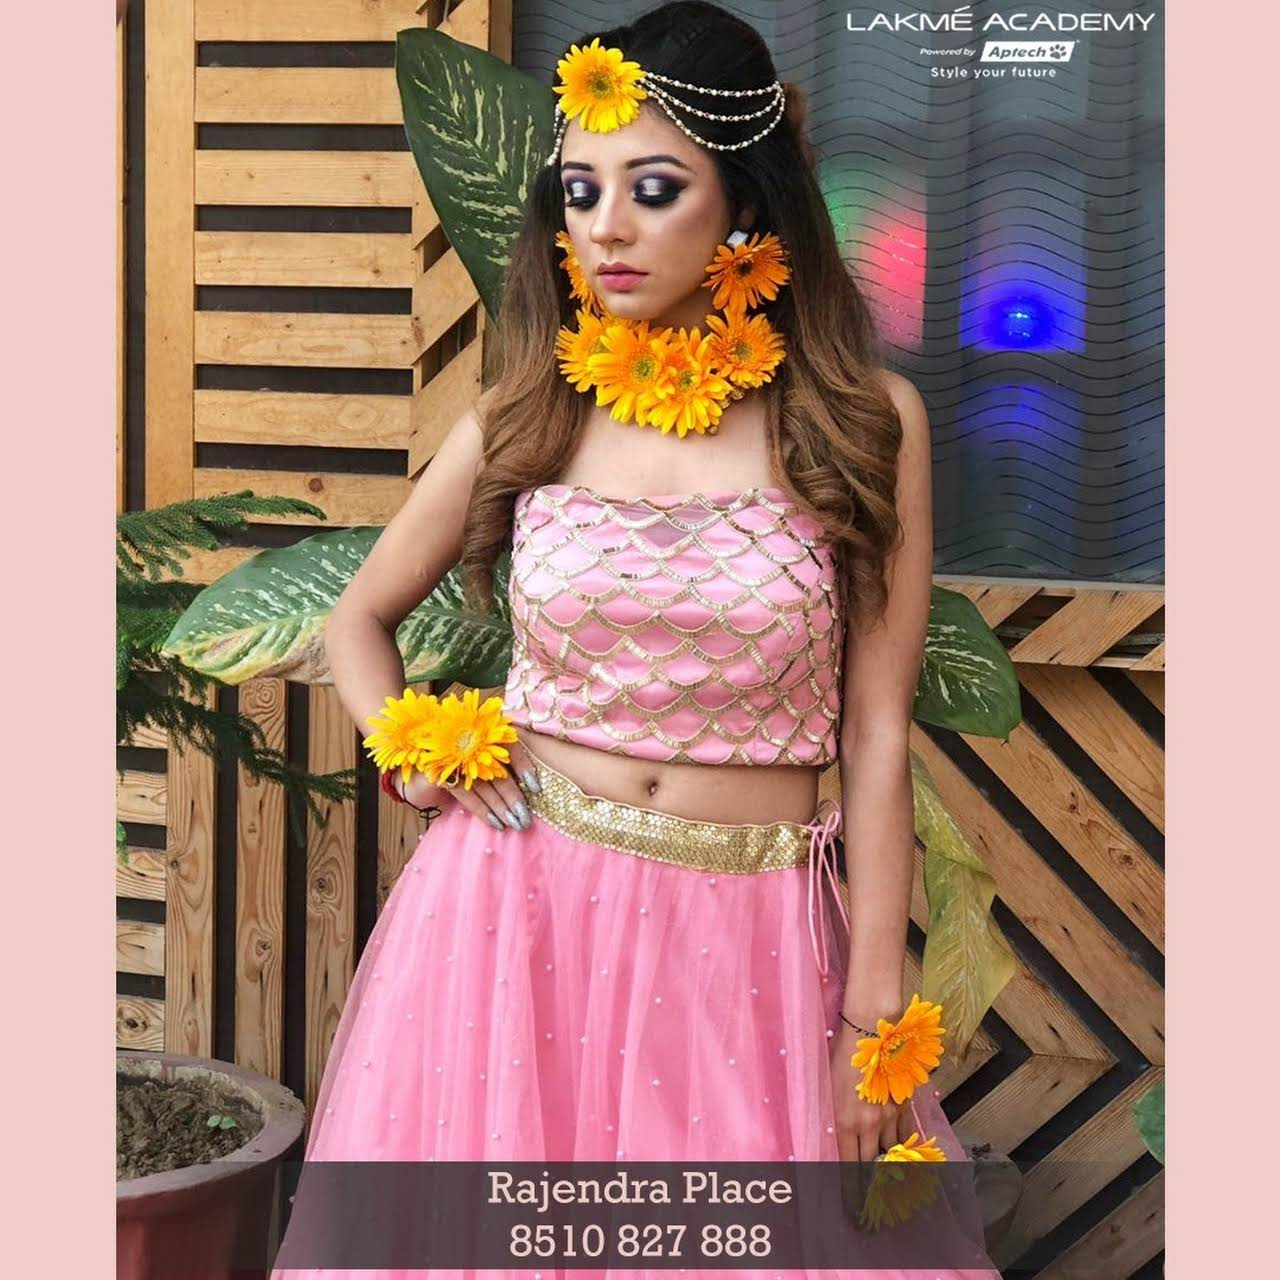 Lakme Academy Rajendra Place | Makeup Artist Course | Delhi